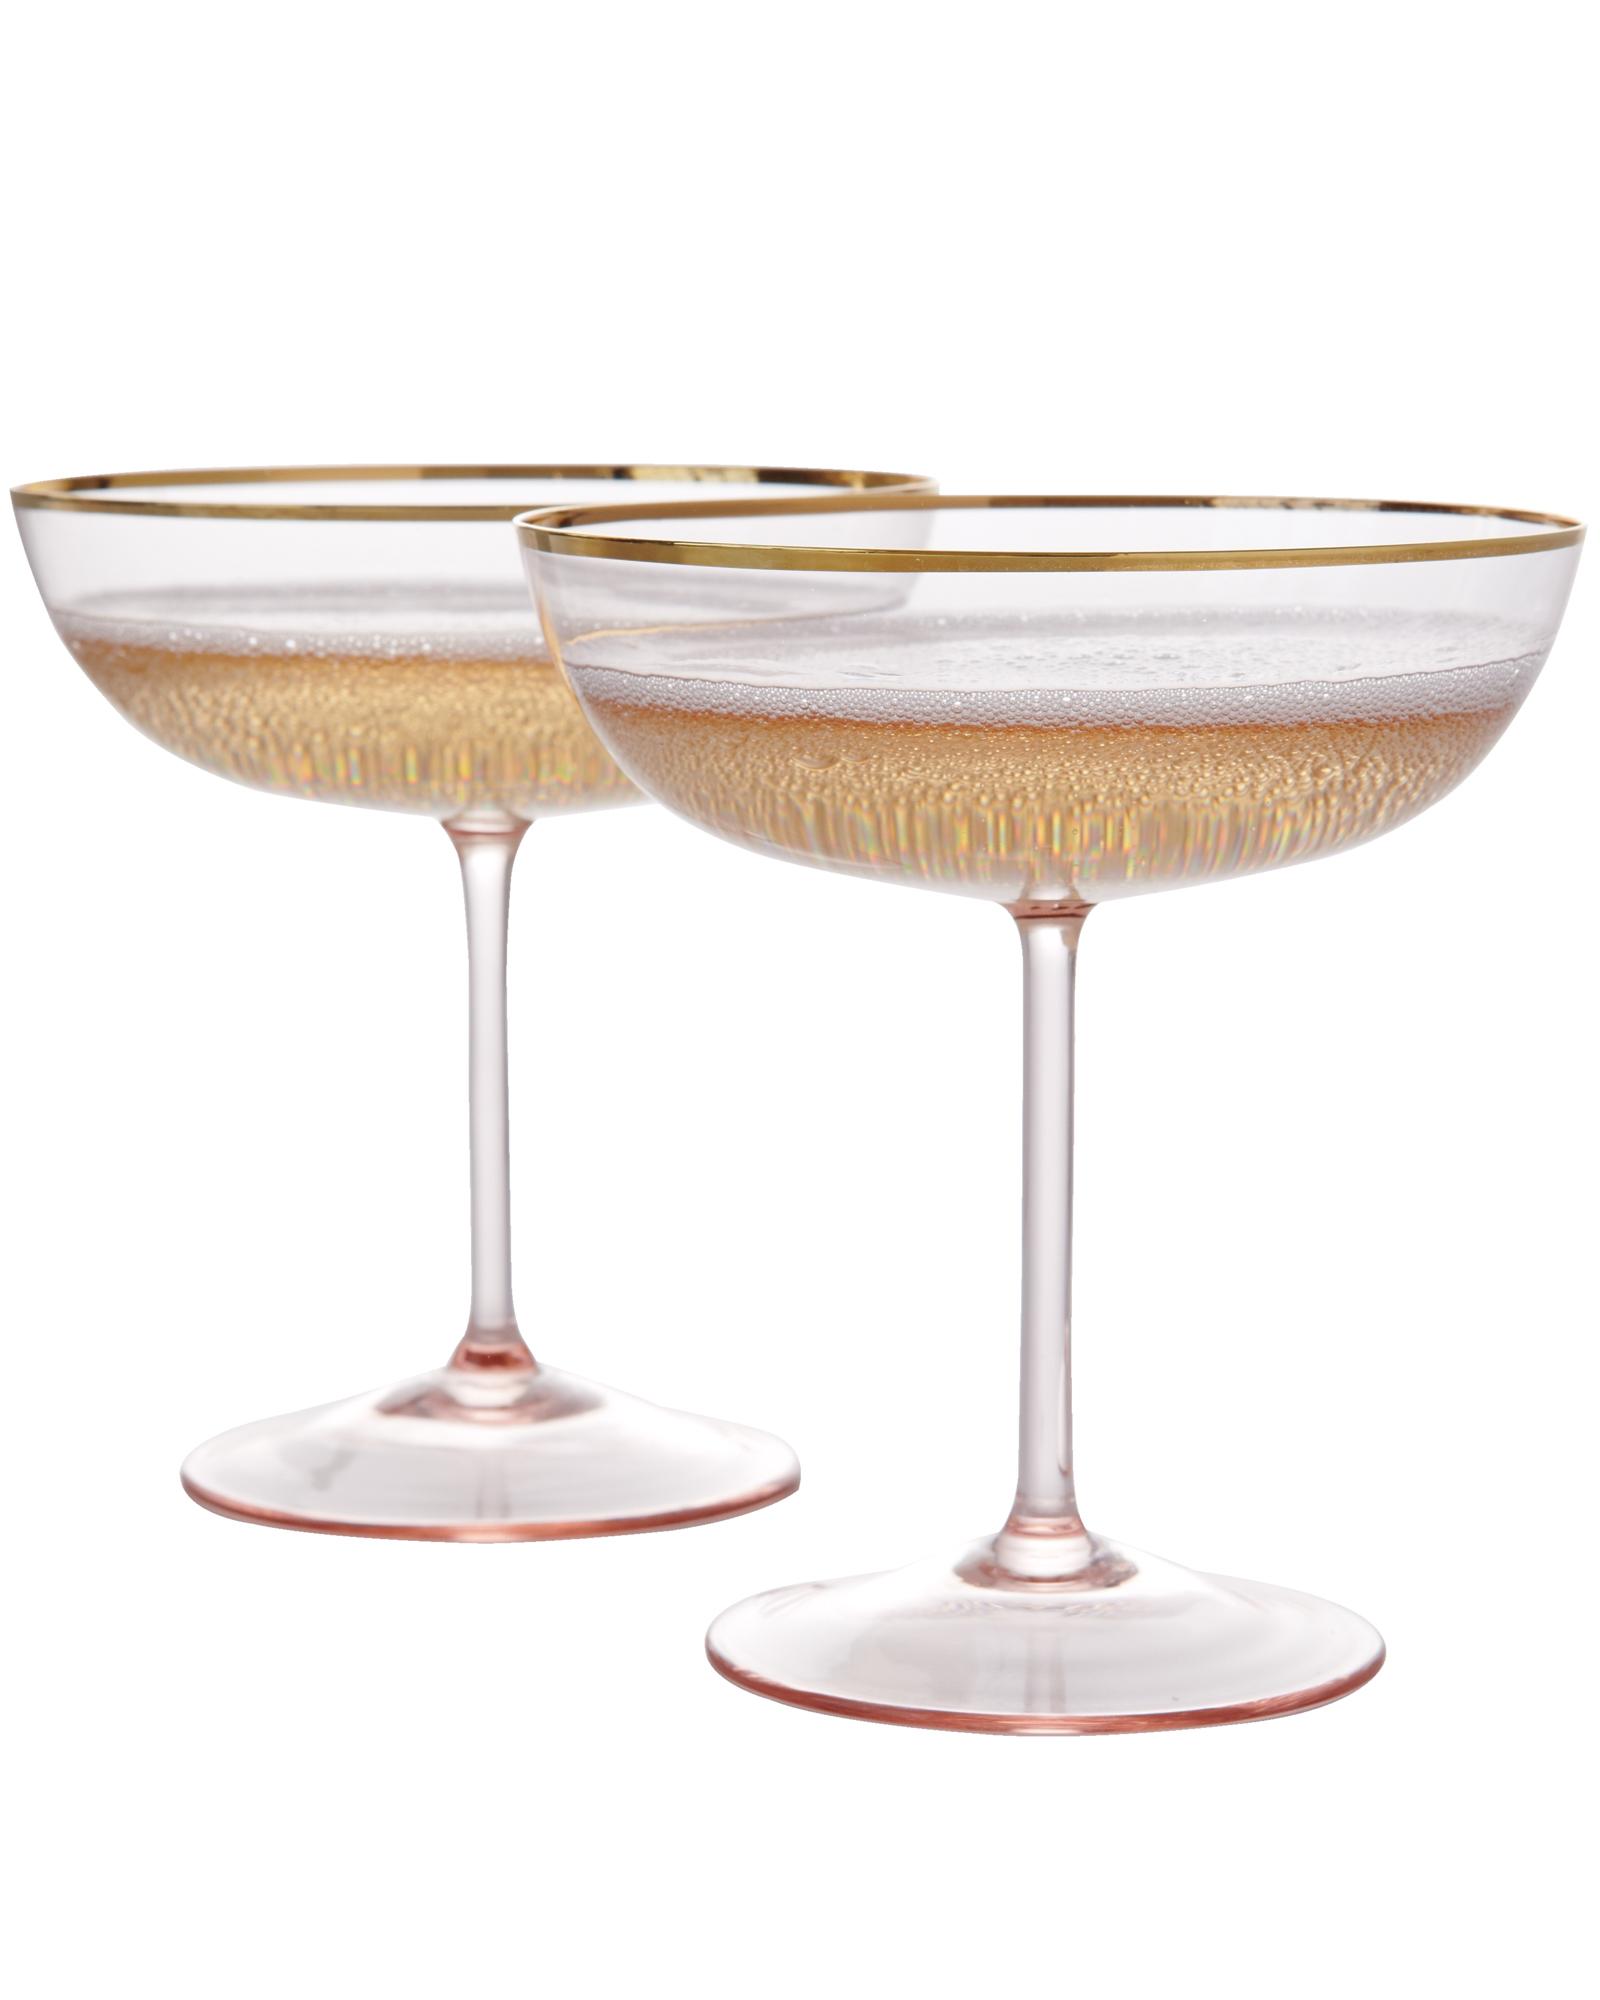 champane-mwd107931.jpg